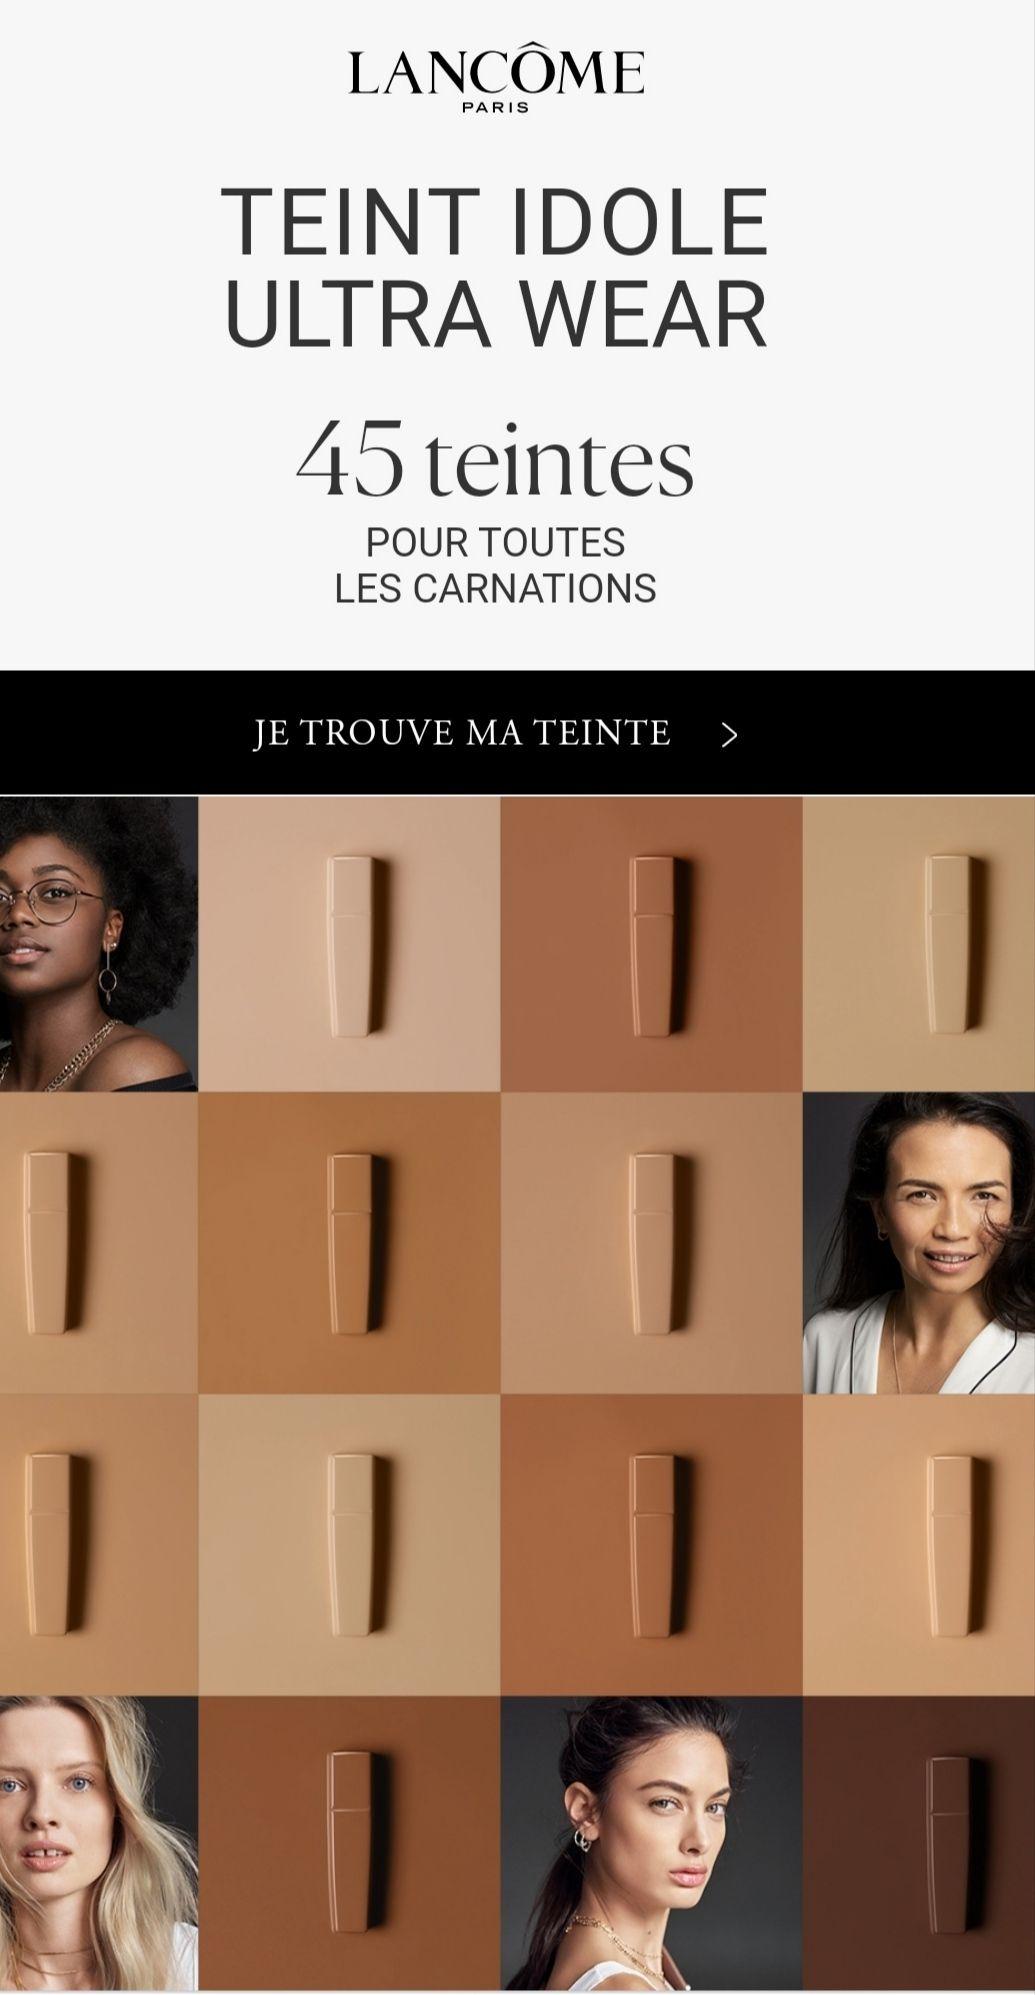 Échantillon gratuit Lancôme Paris - Fond de teint Idole Ultra Wear